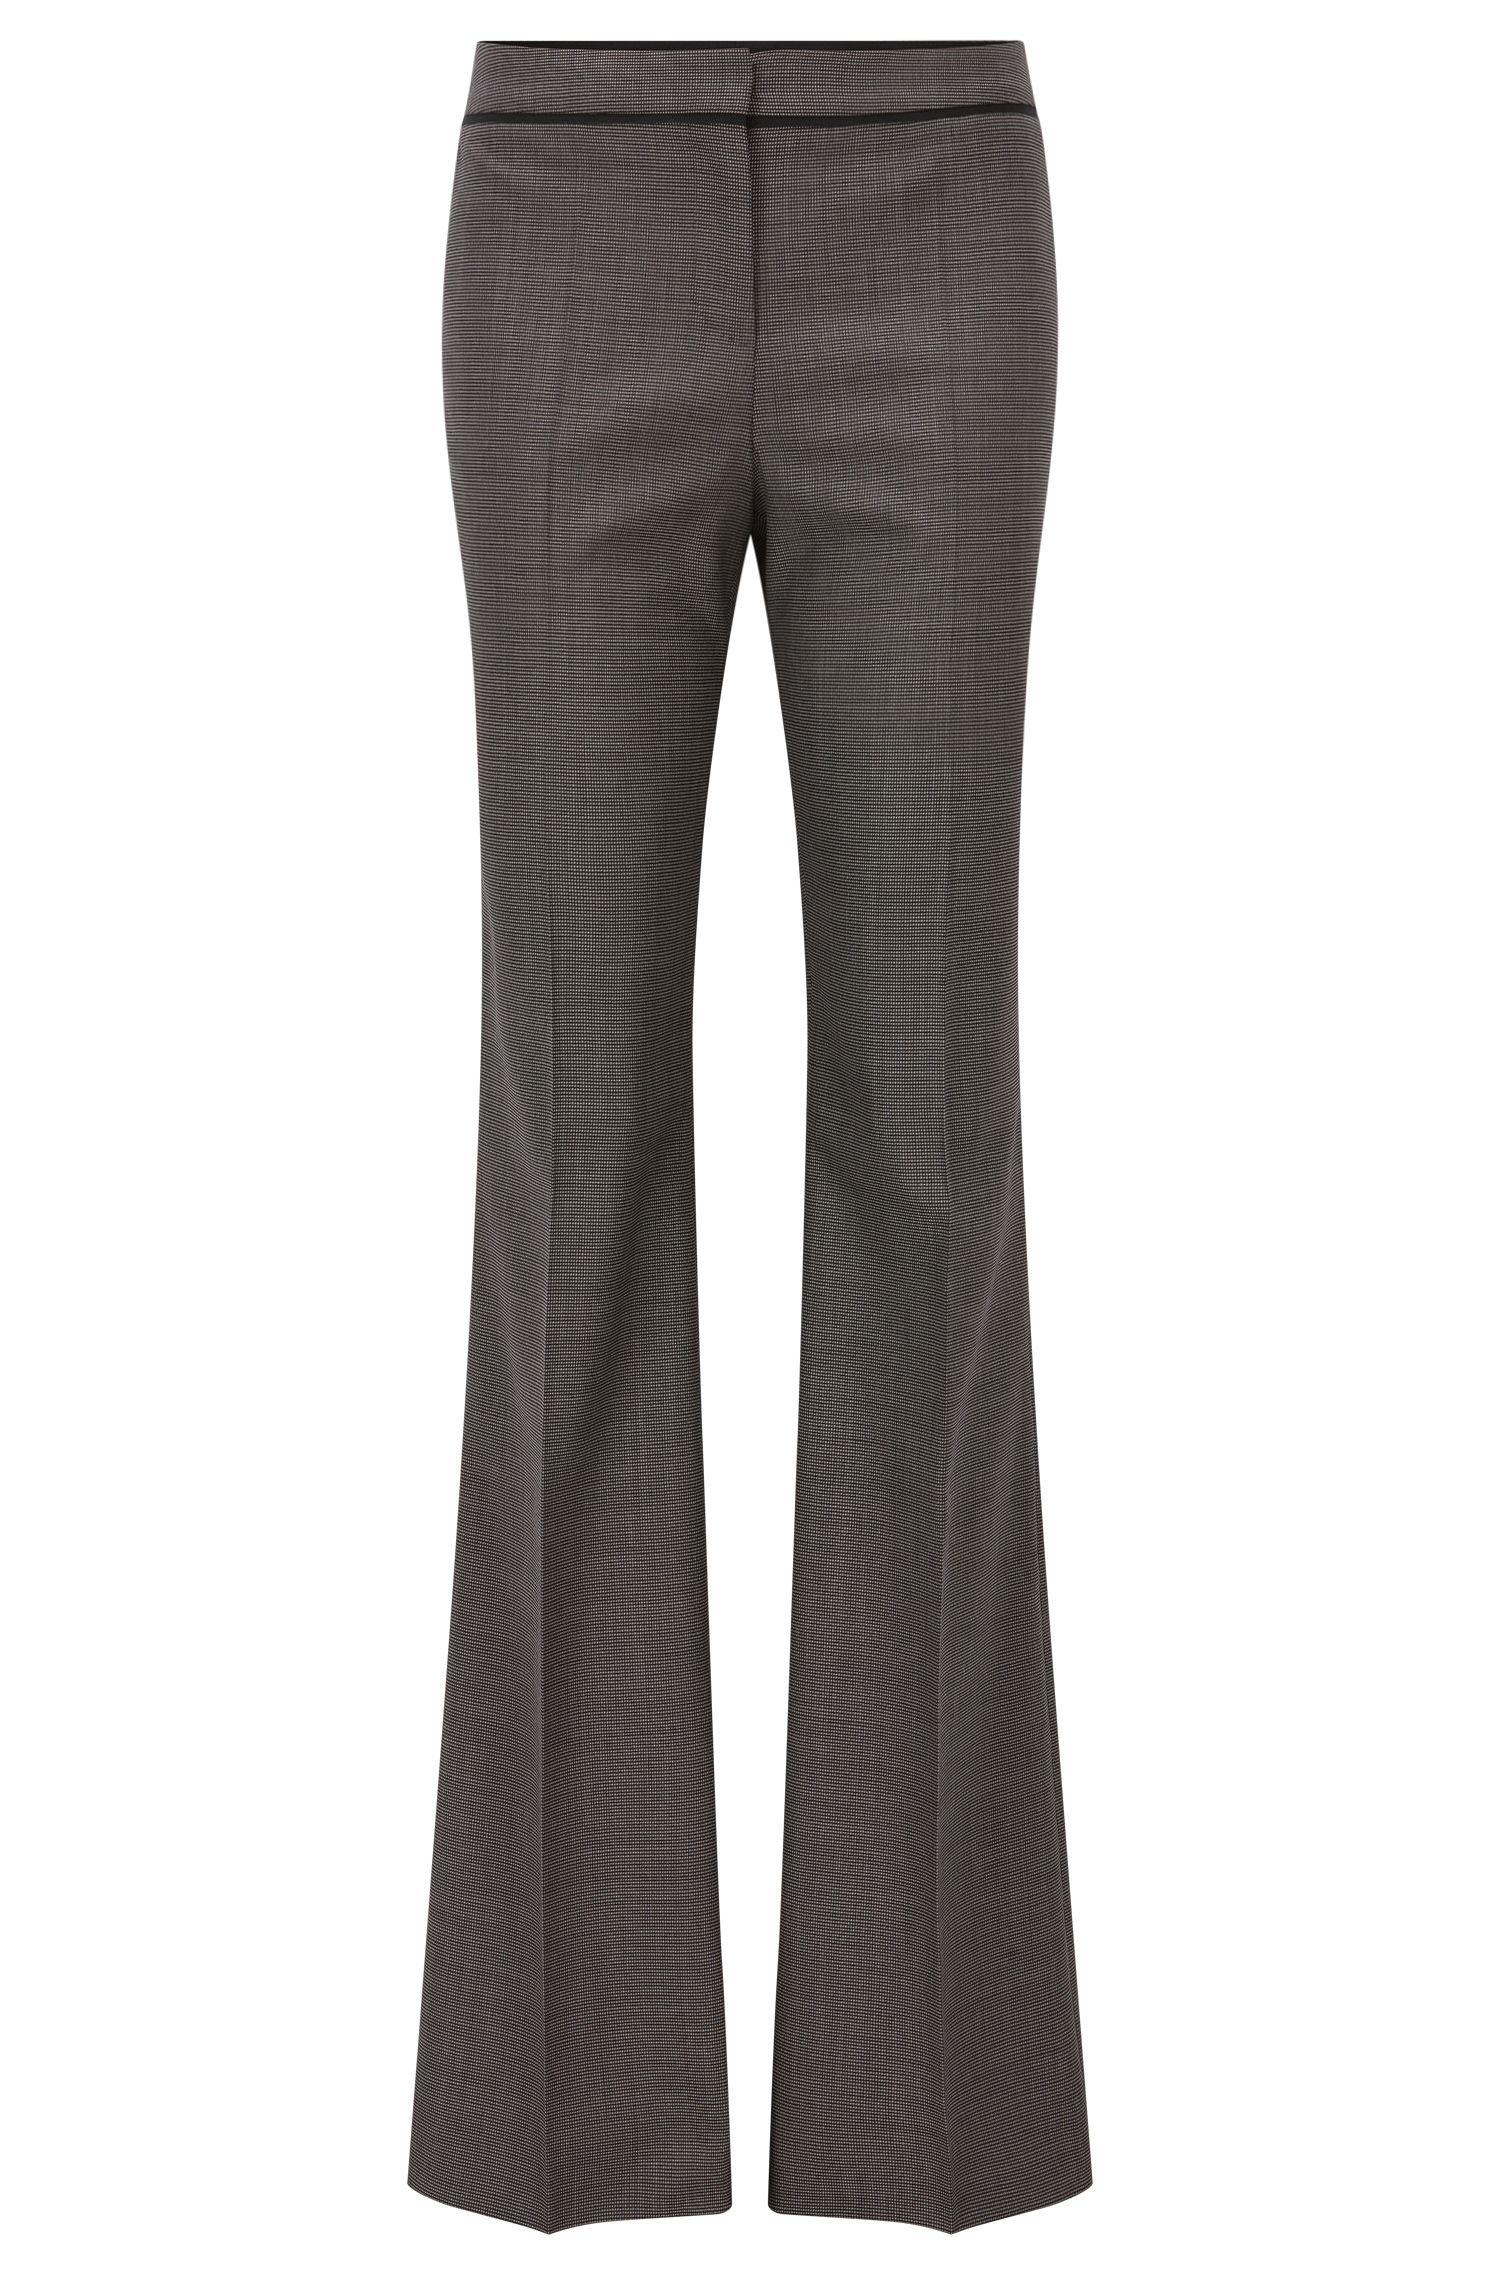 Pindot Stretch Virgin Wool Pant | Tulea